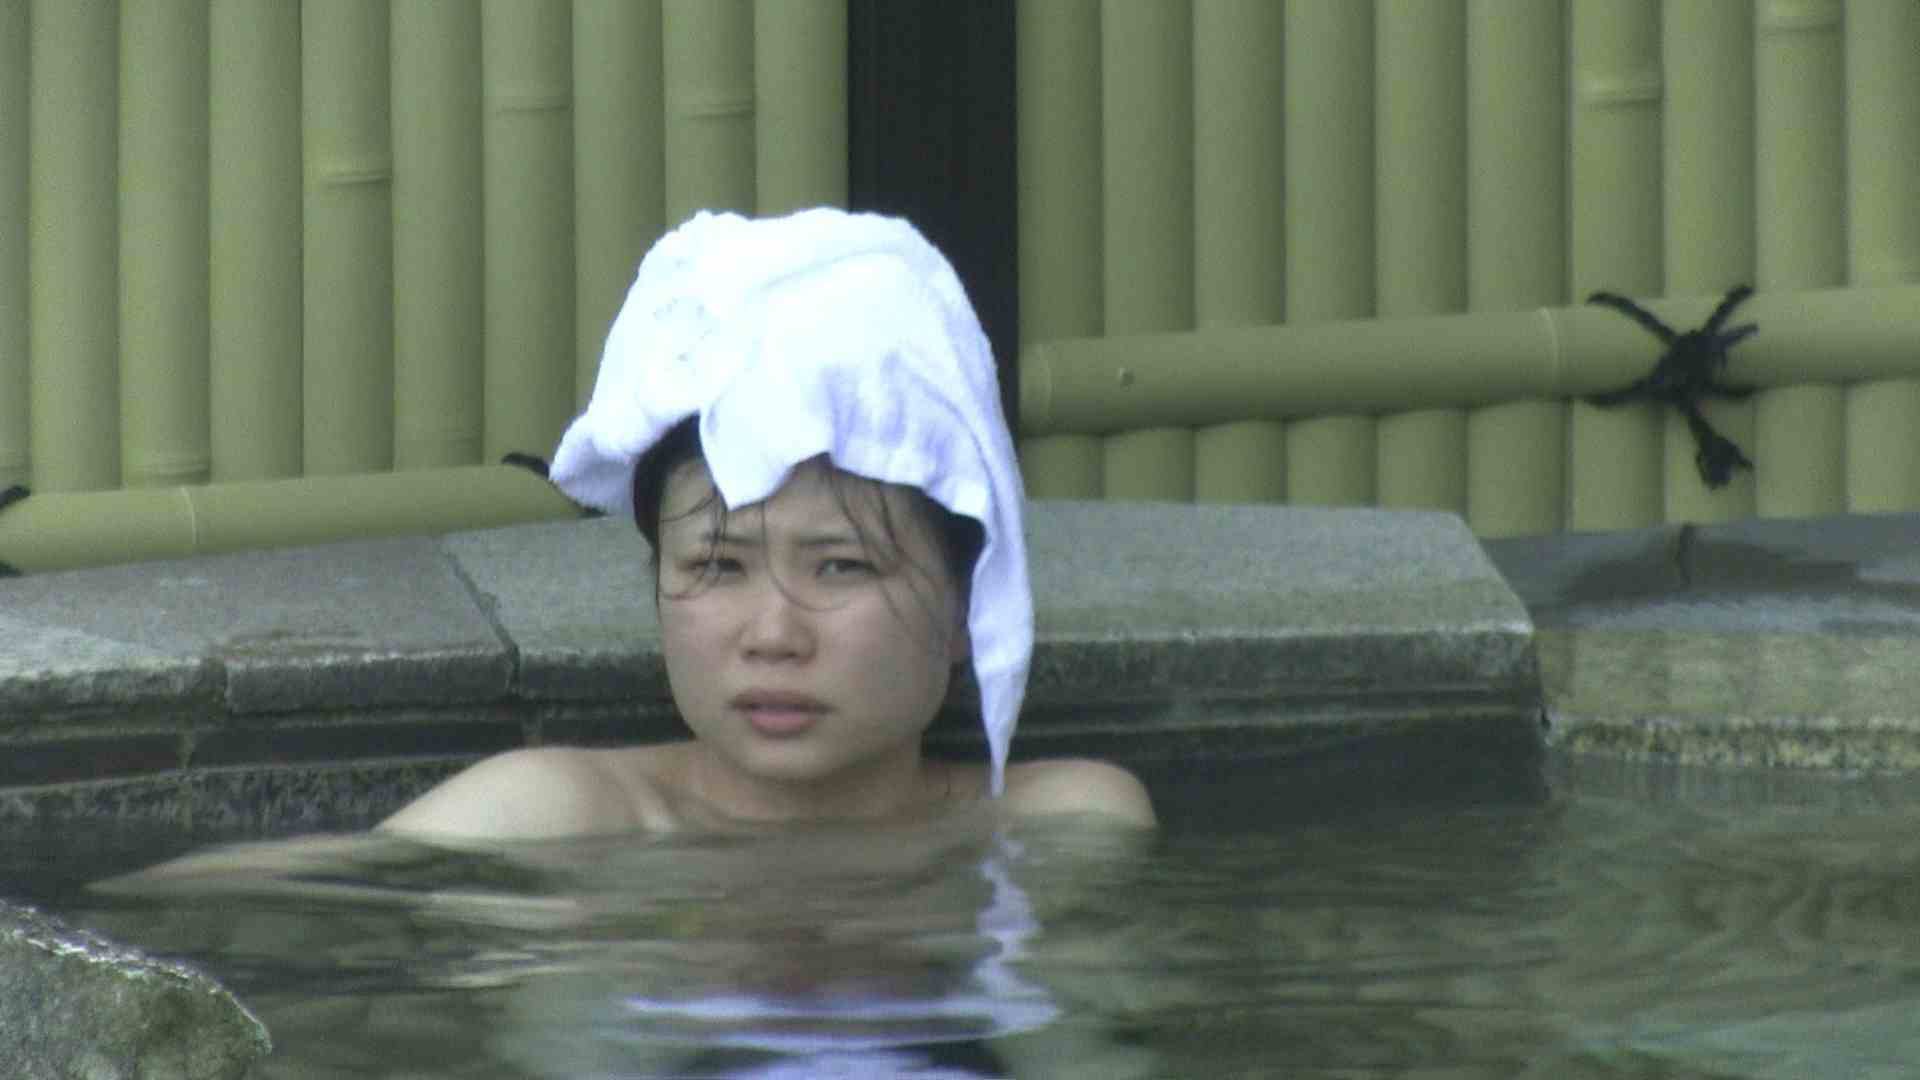 Aquaな露天風呂Vol.183 盗撮師作品 エロ無料画像 105pic 71